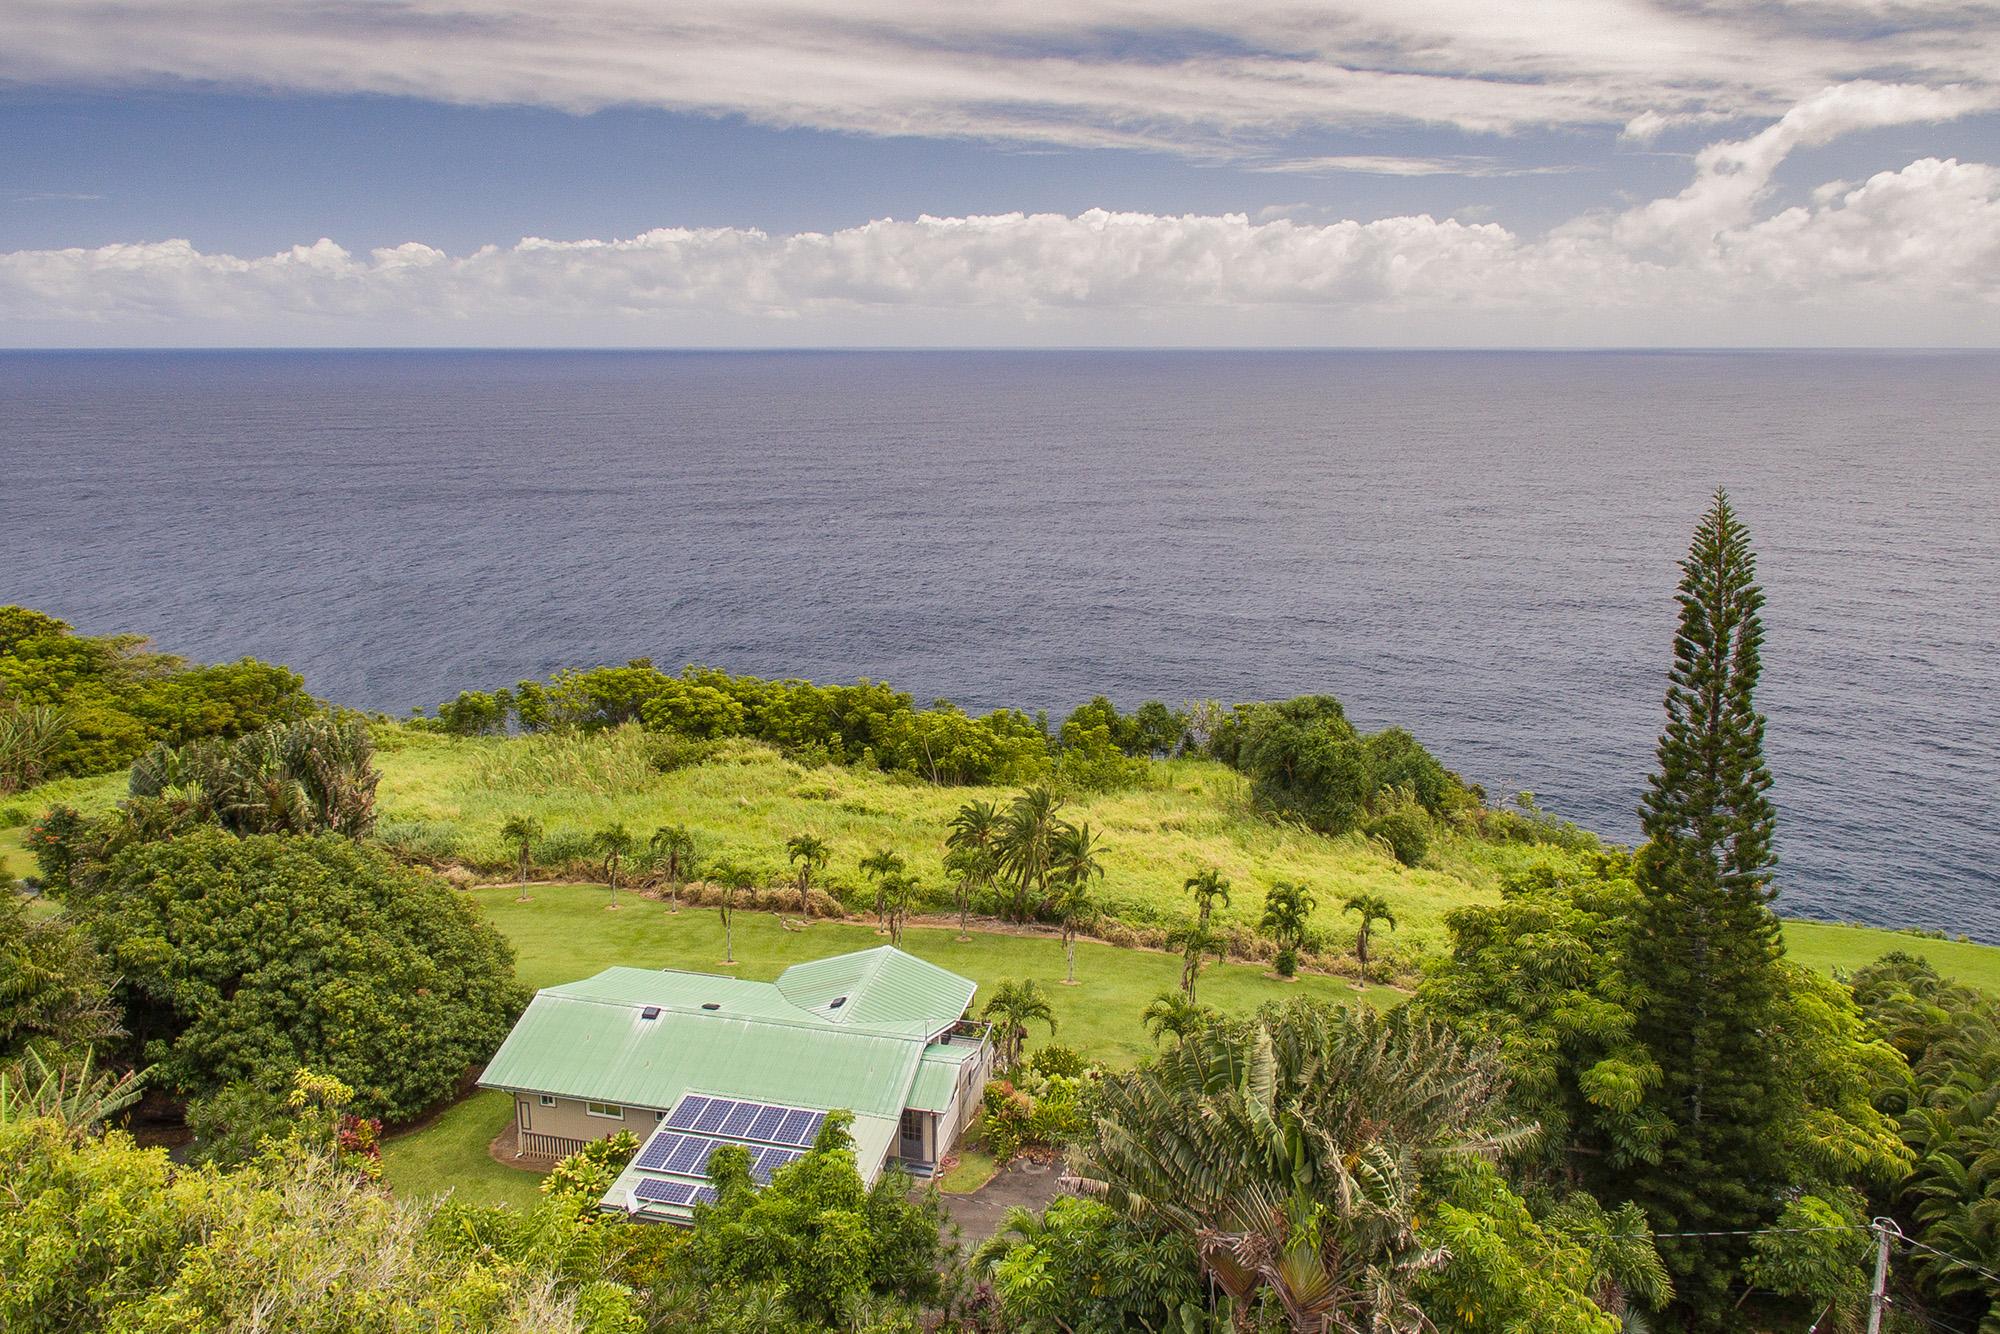 Hawaii Vacation Rental Home, Solar Power, Investment Property, Hawaii Investment Property, Hawaii Property Management